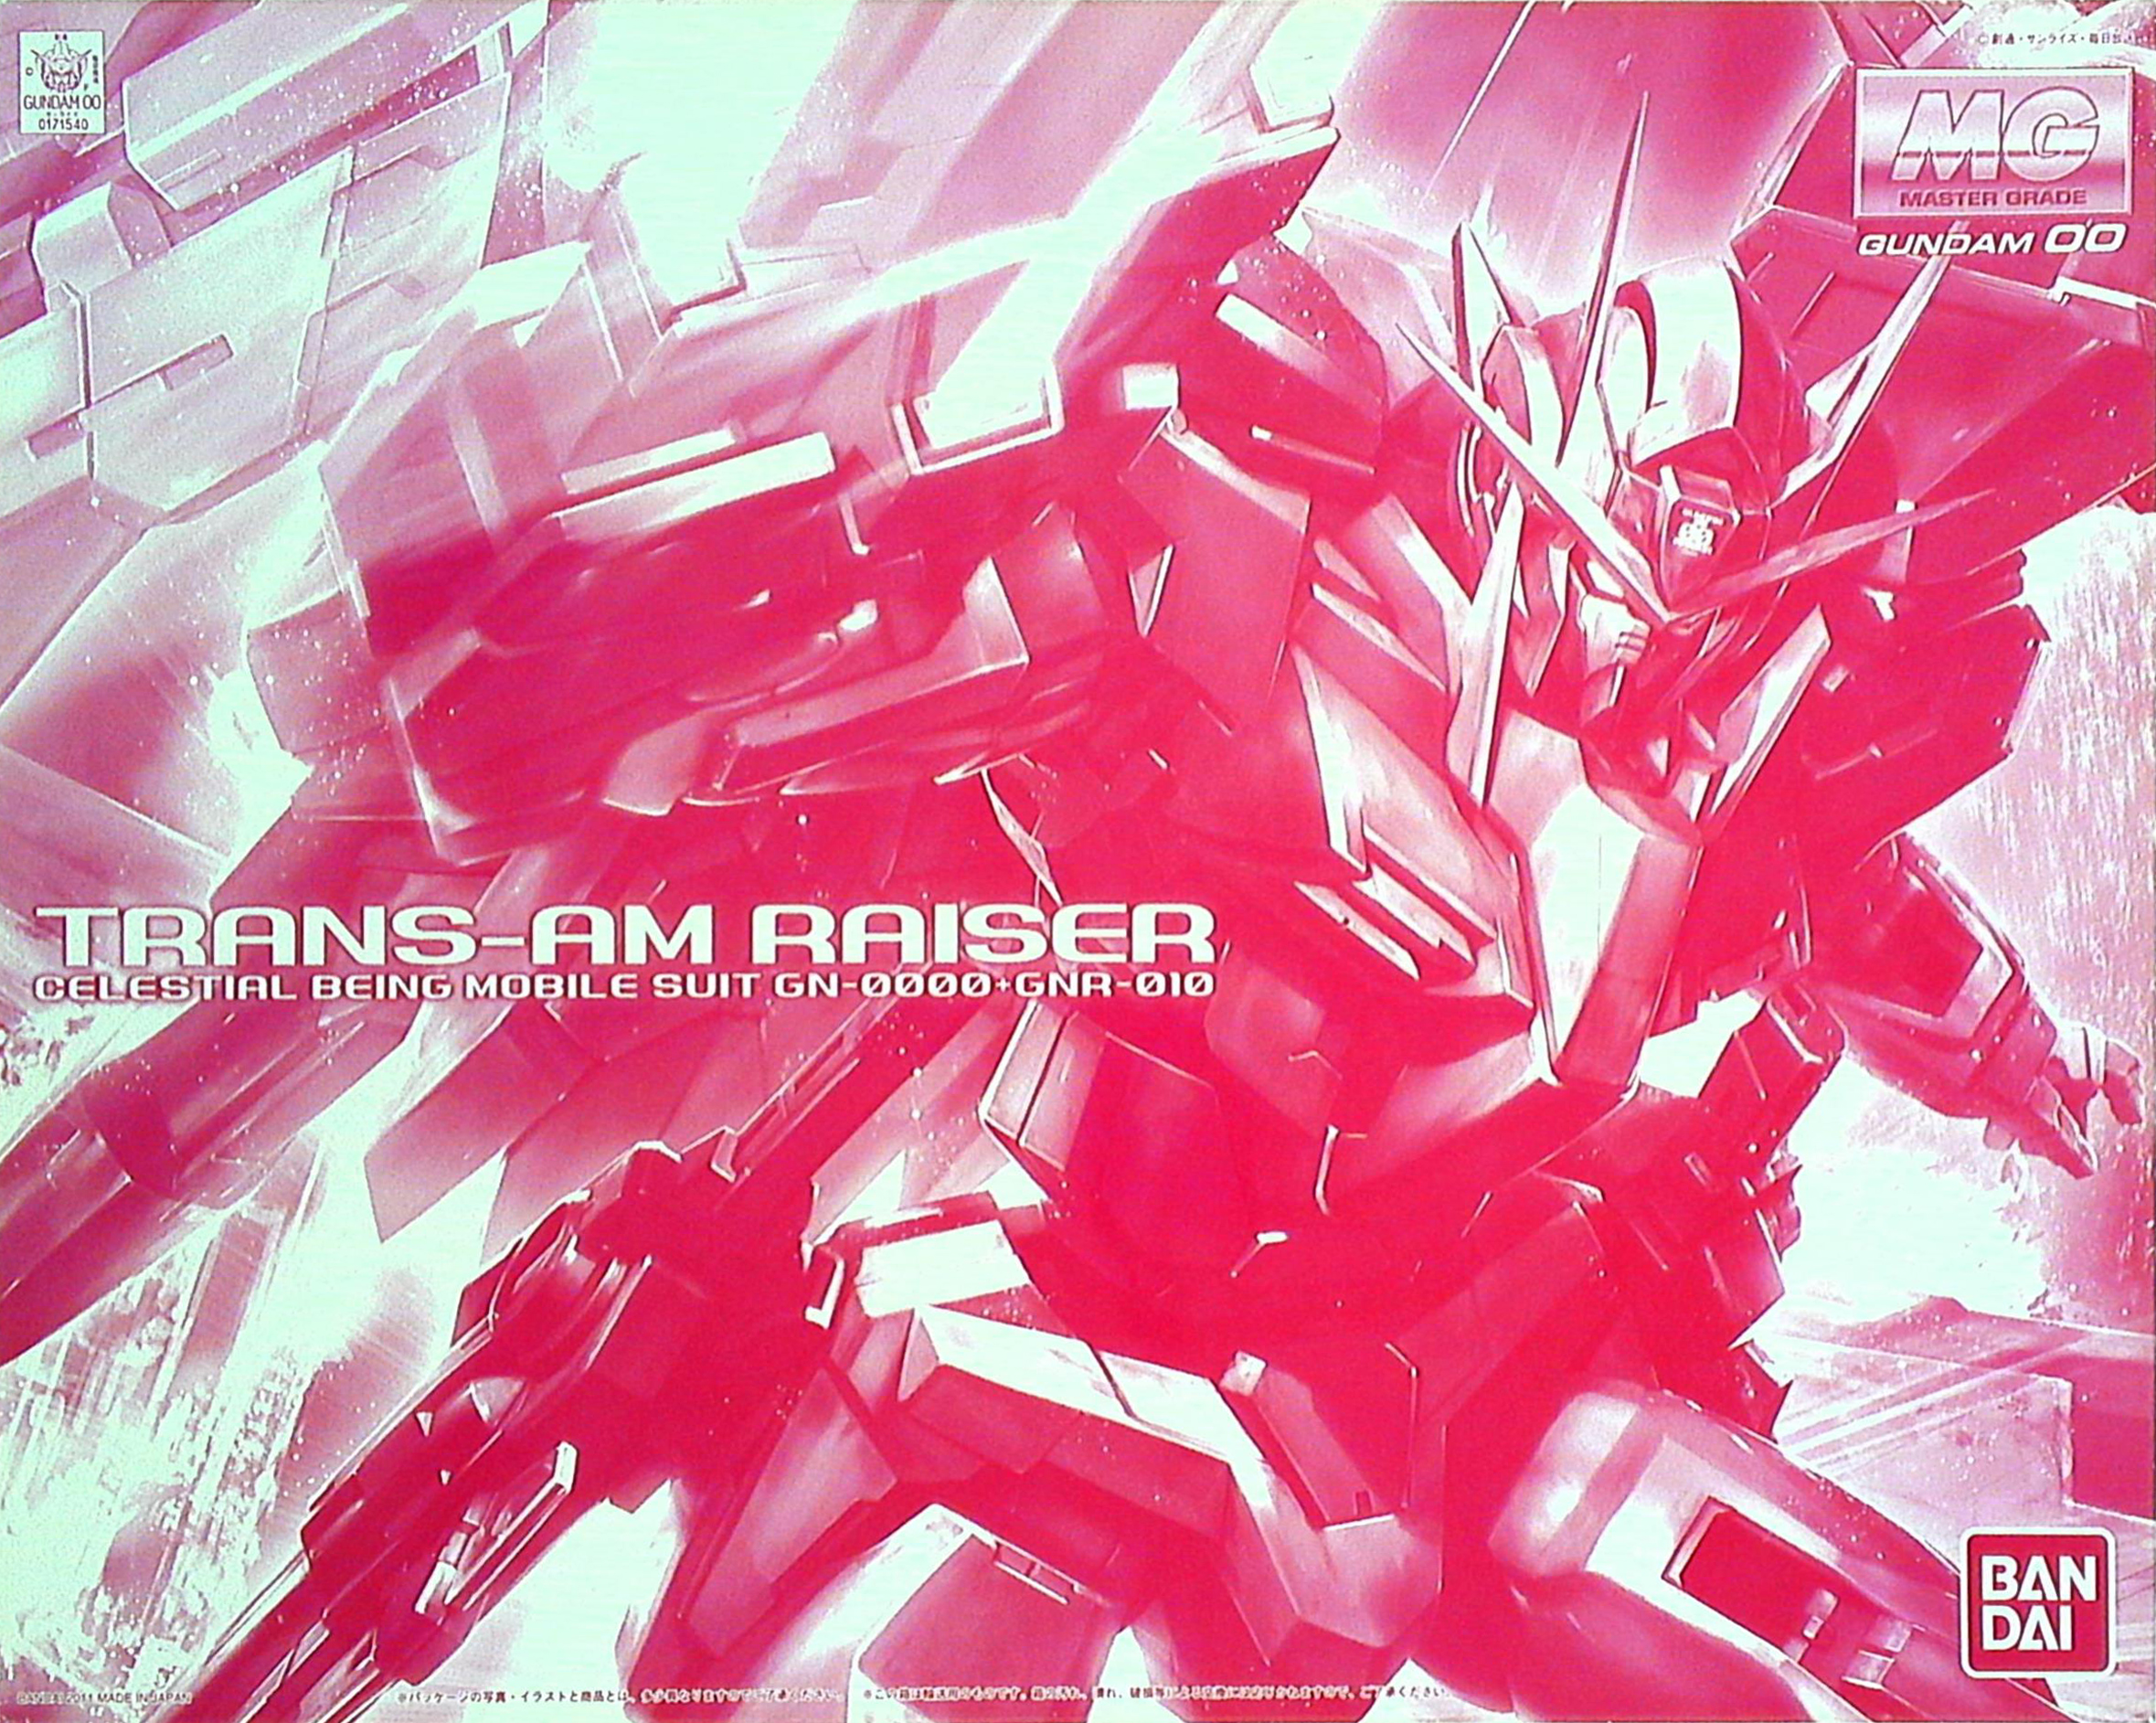 File:MG Trans-Am Raiser.jpg